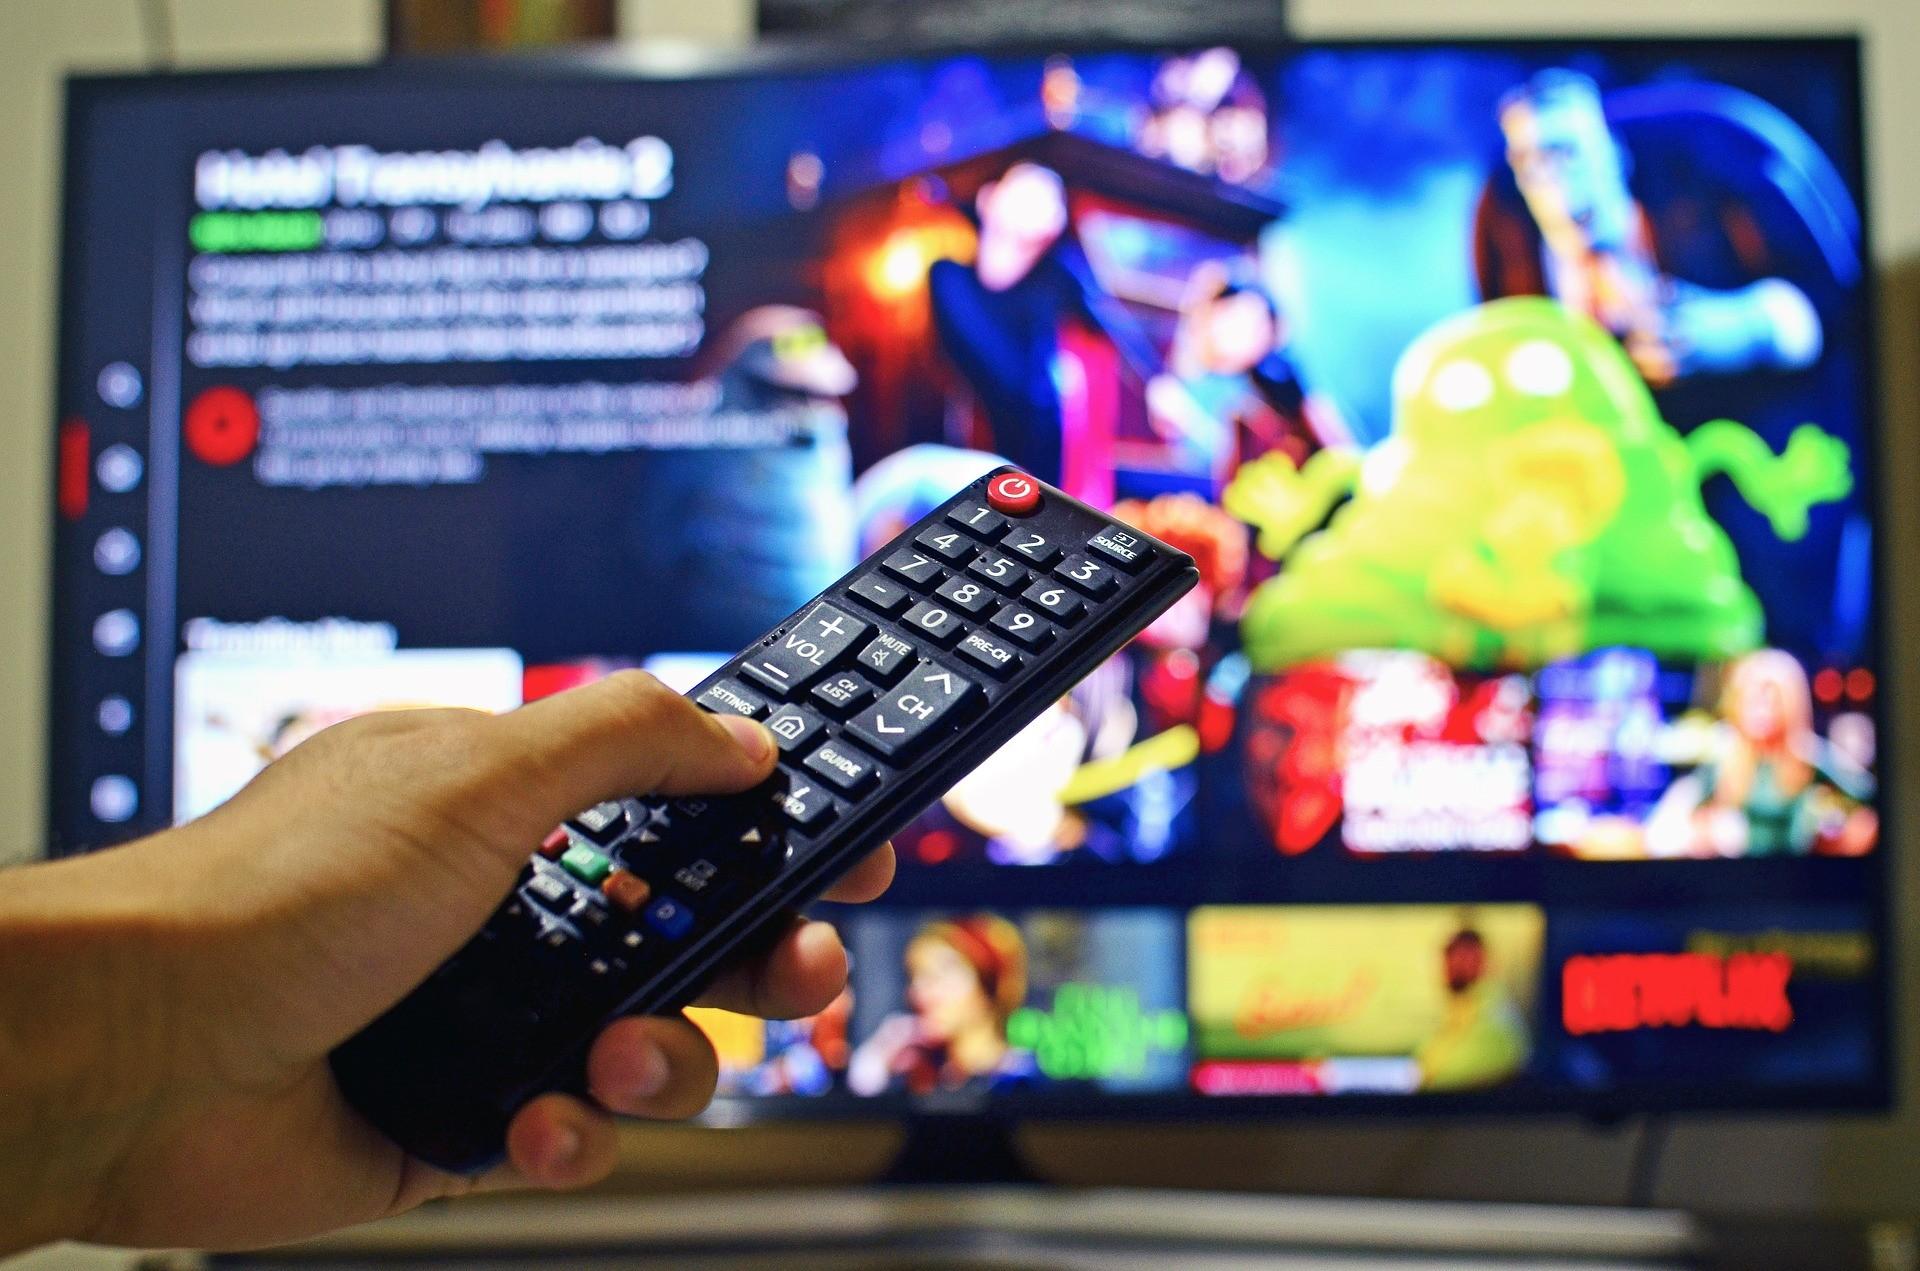 NCC,有線電視,市場政策,交易選擇權,獨佔企業,OTT服務,數位轉型